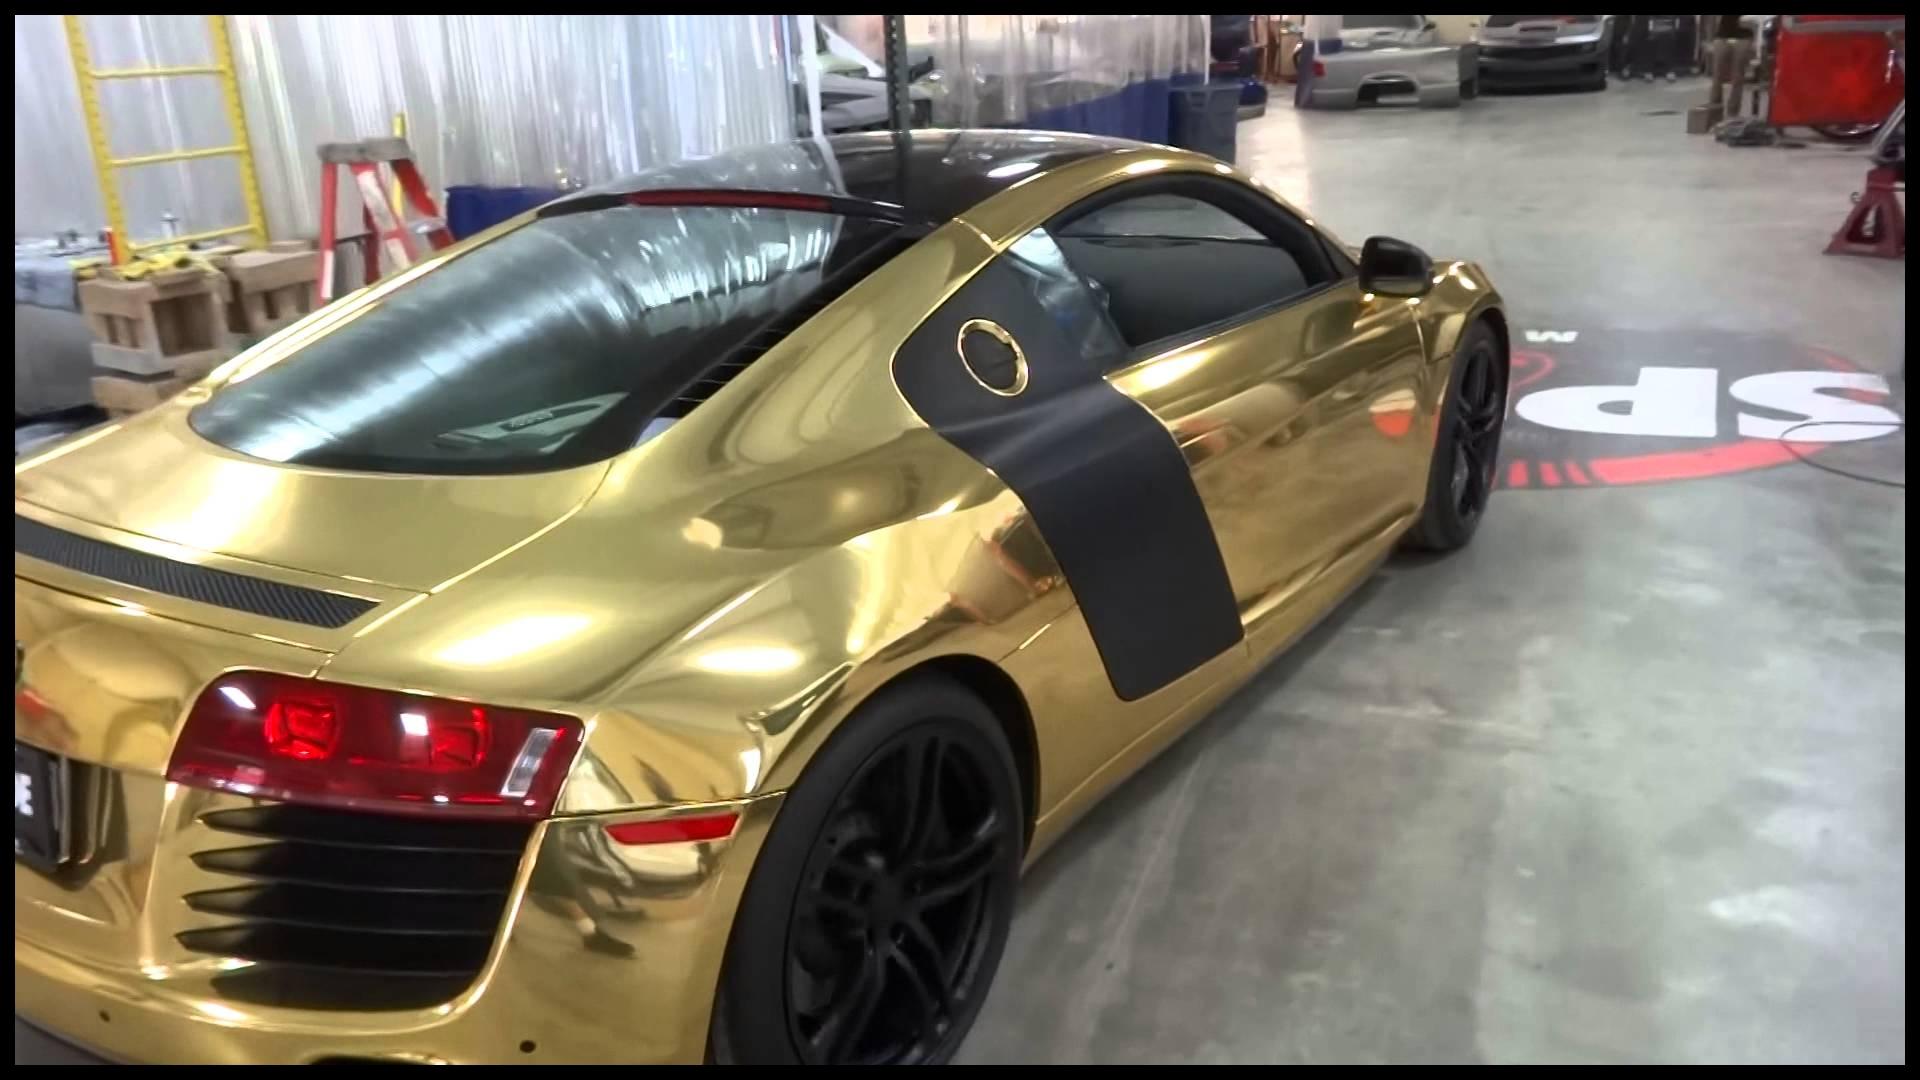 Gold Audi R8 Leaving